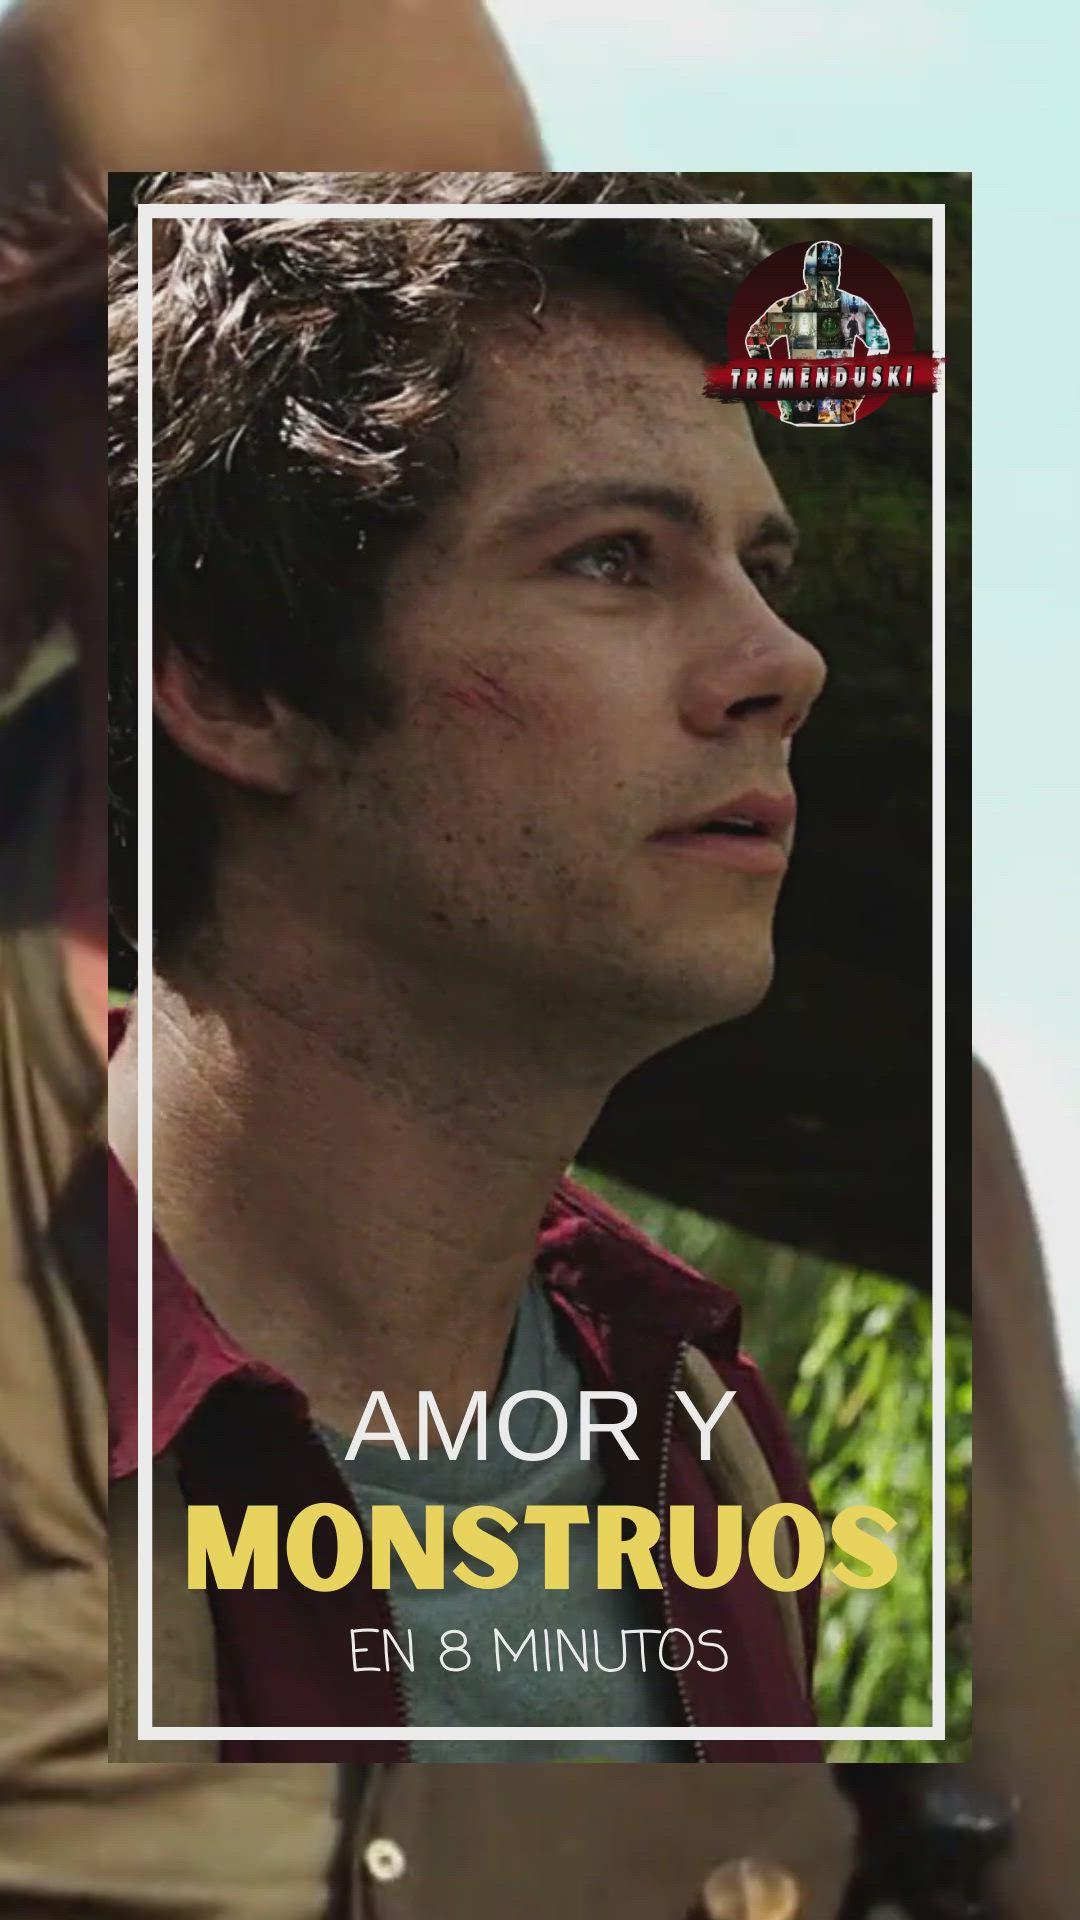 Monstruos De Amor Y Monstruos En 2021 Amor Y Monstruos Monstruos Cine